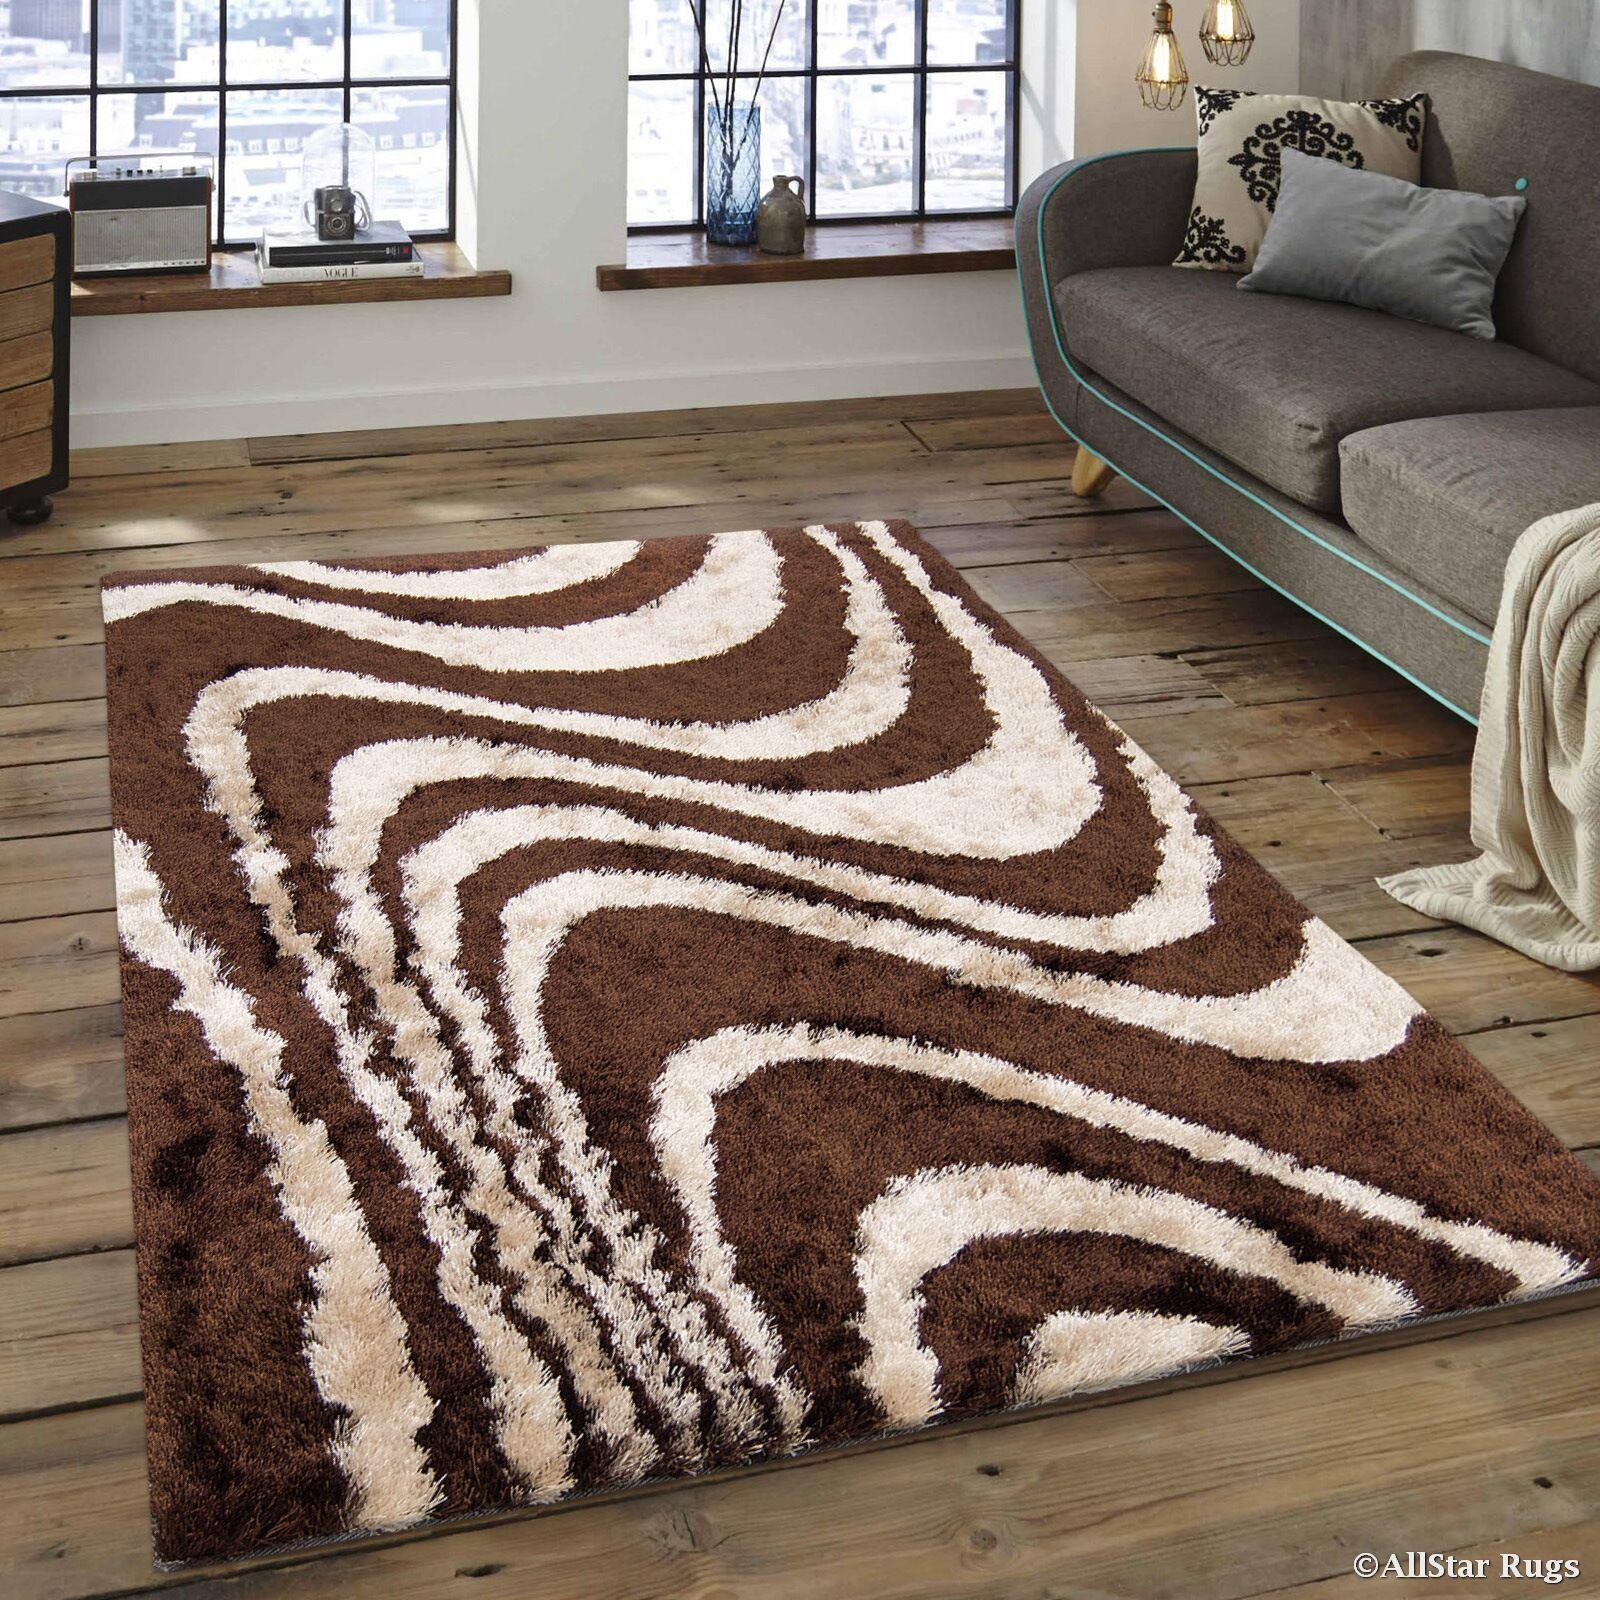 Hand-Tufted Brown/Beige Area Rug Rug Size: 4'11